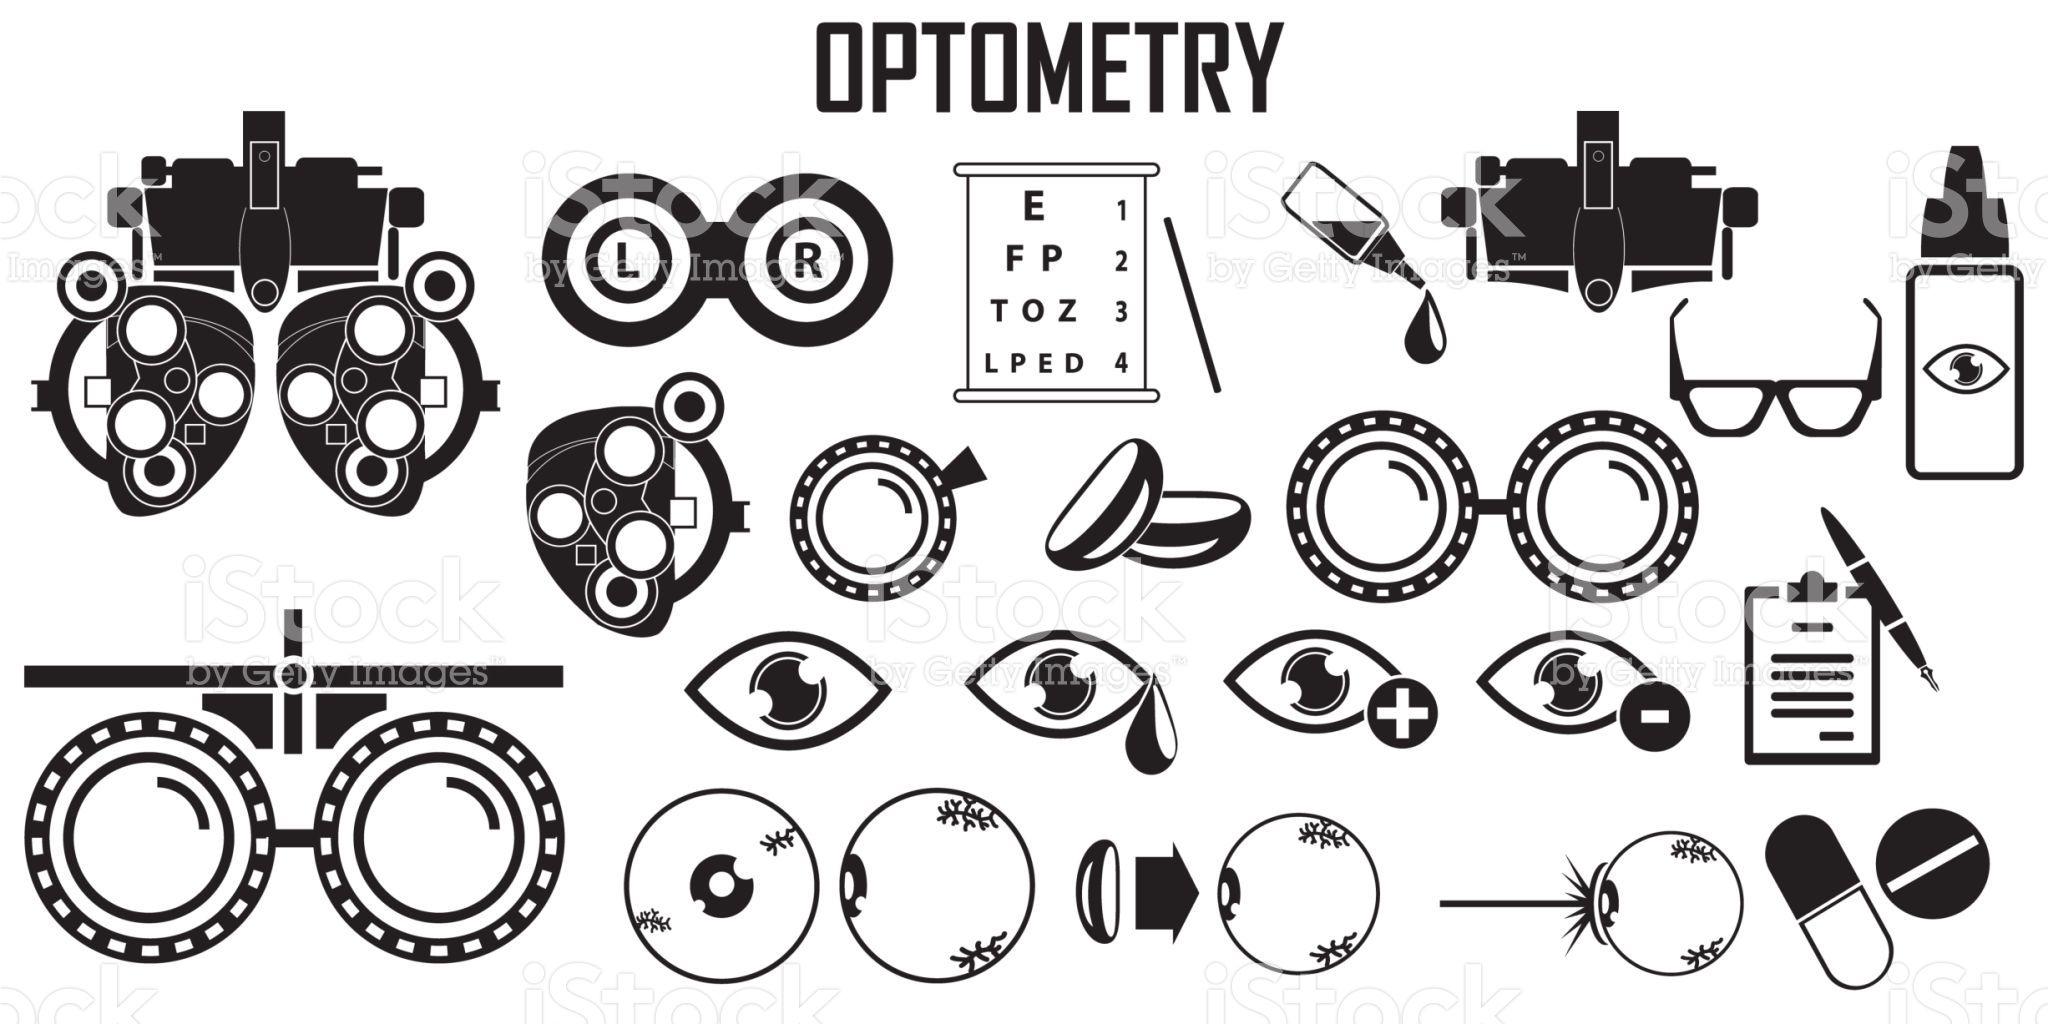 Optometry Icons Set. royaltyfree optometry icons set